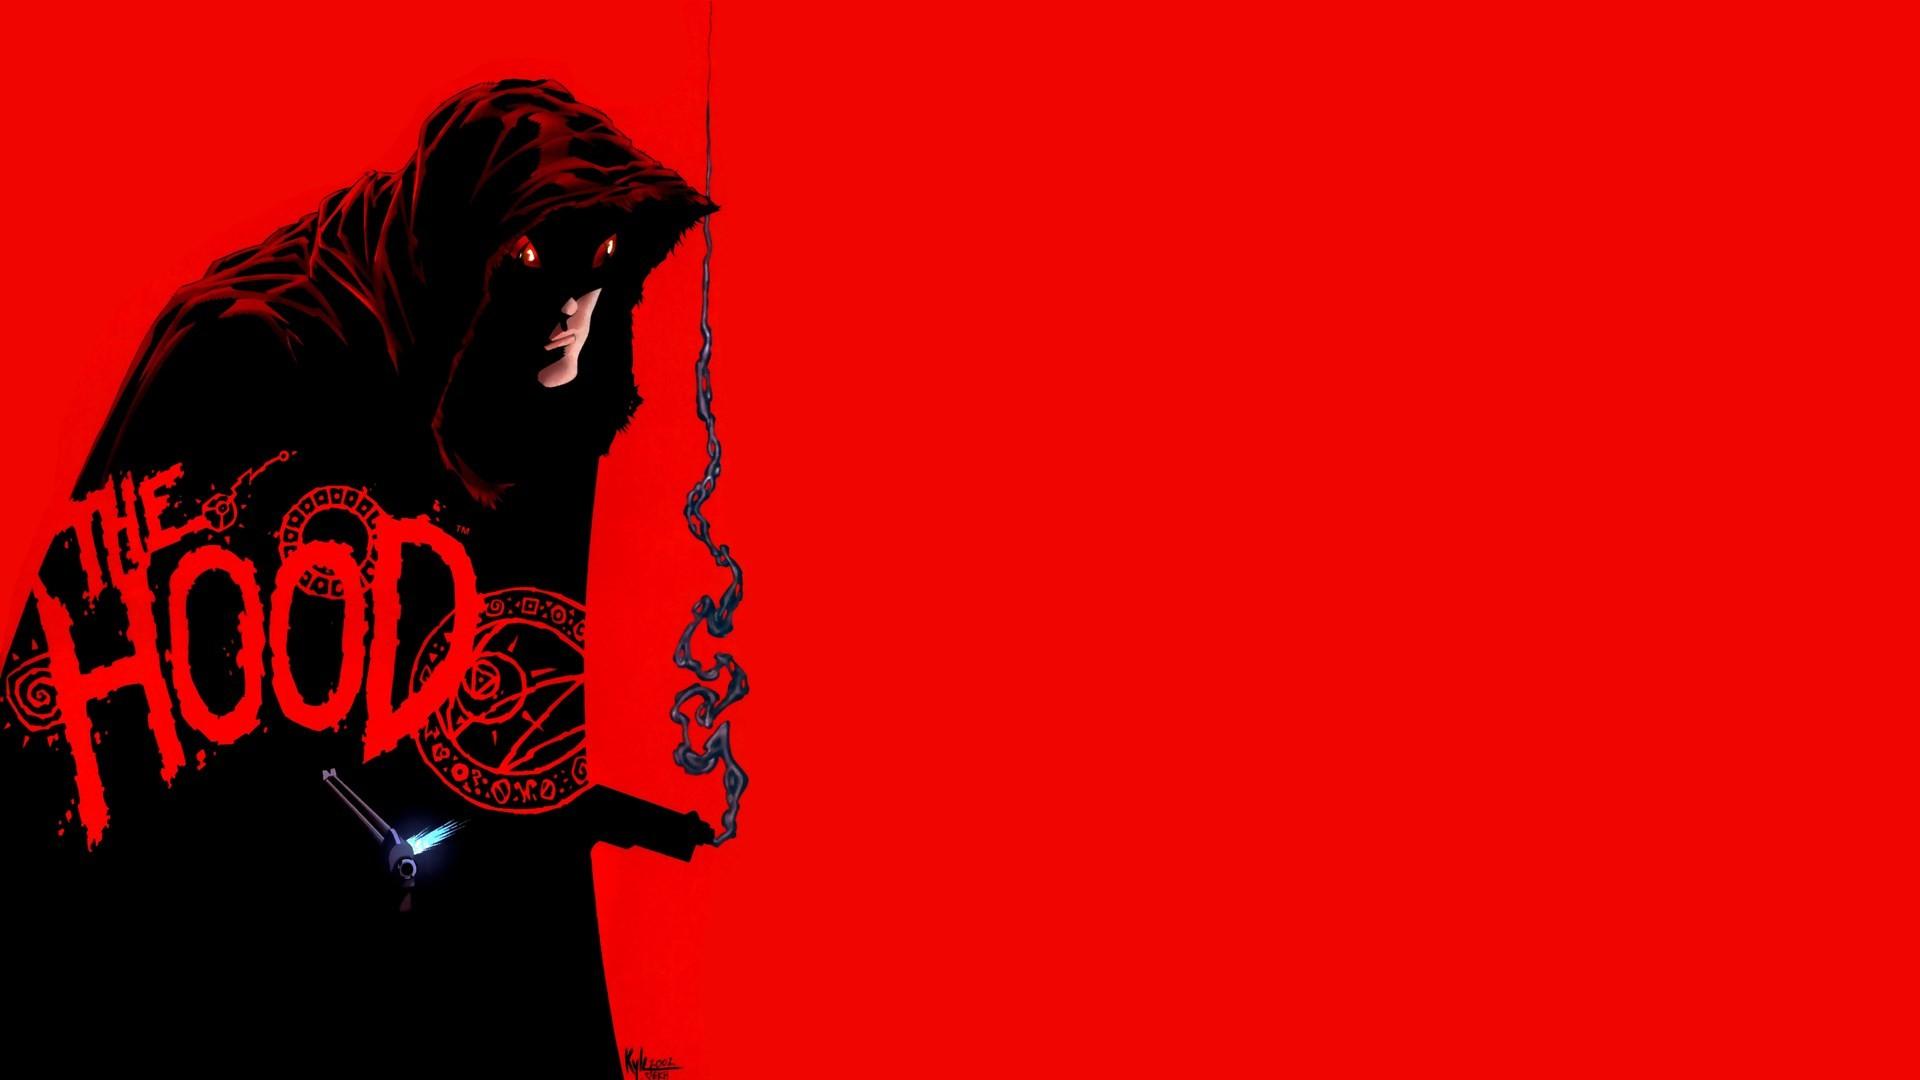 Red Hood Wallpaper 1920x1080: Jason Todd Red Hood Wallpaper (84+ Images